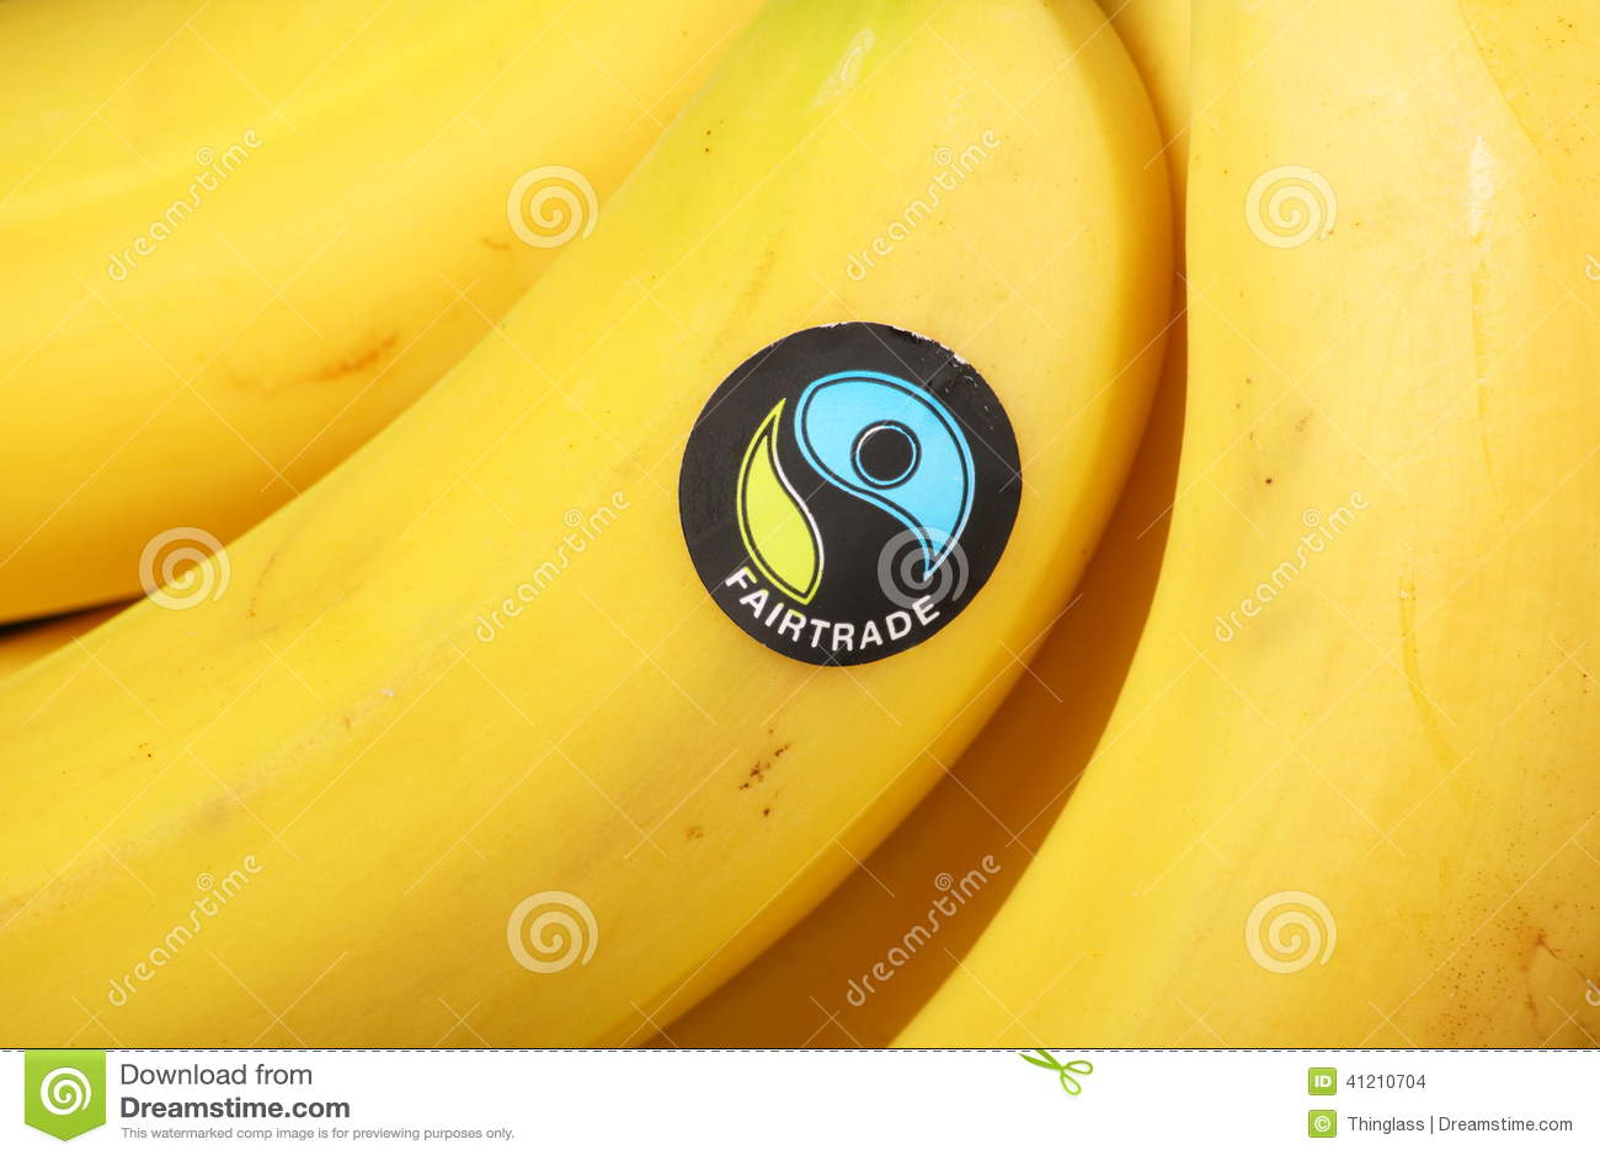 Fairtrade Sticker Editorial Stock Image